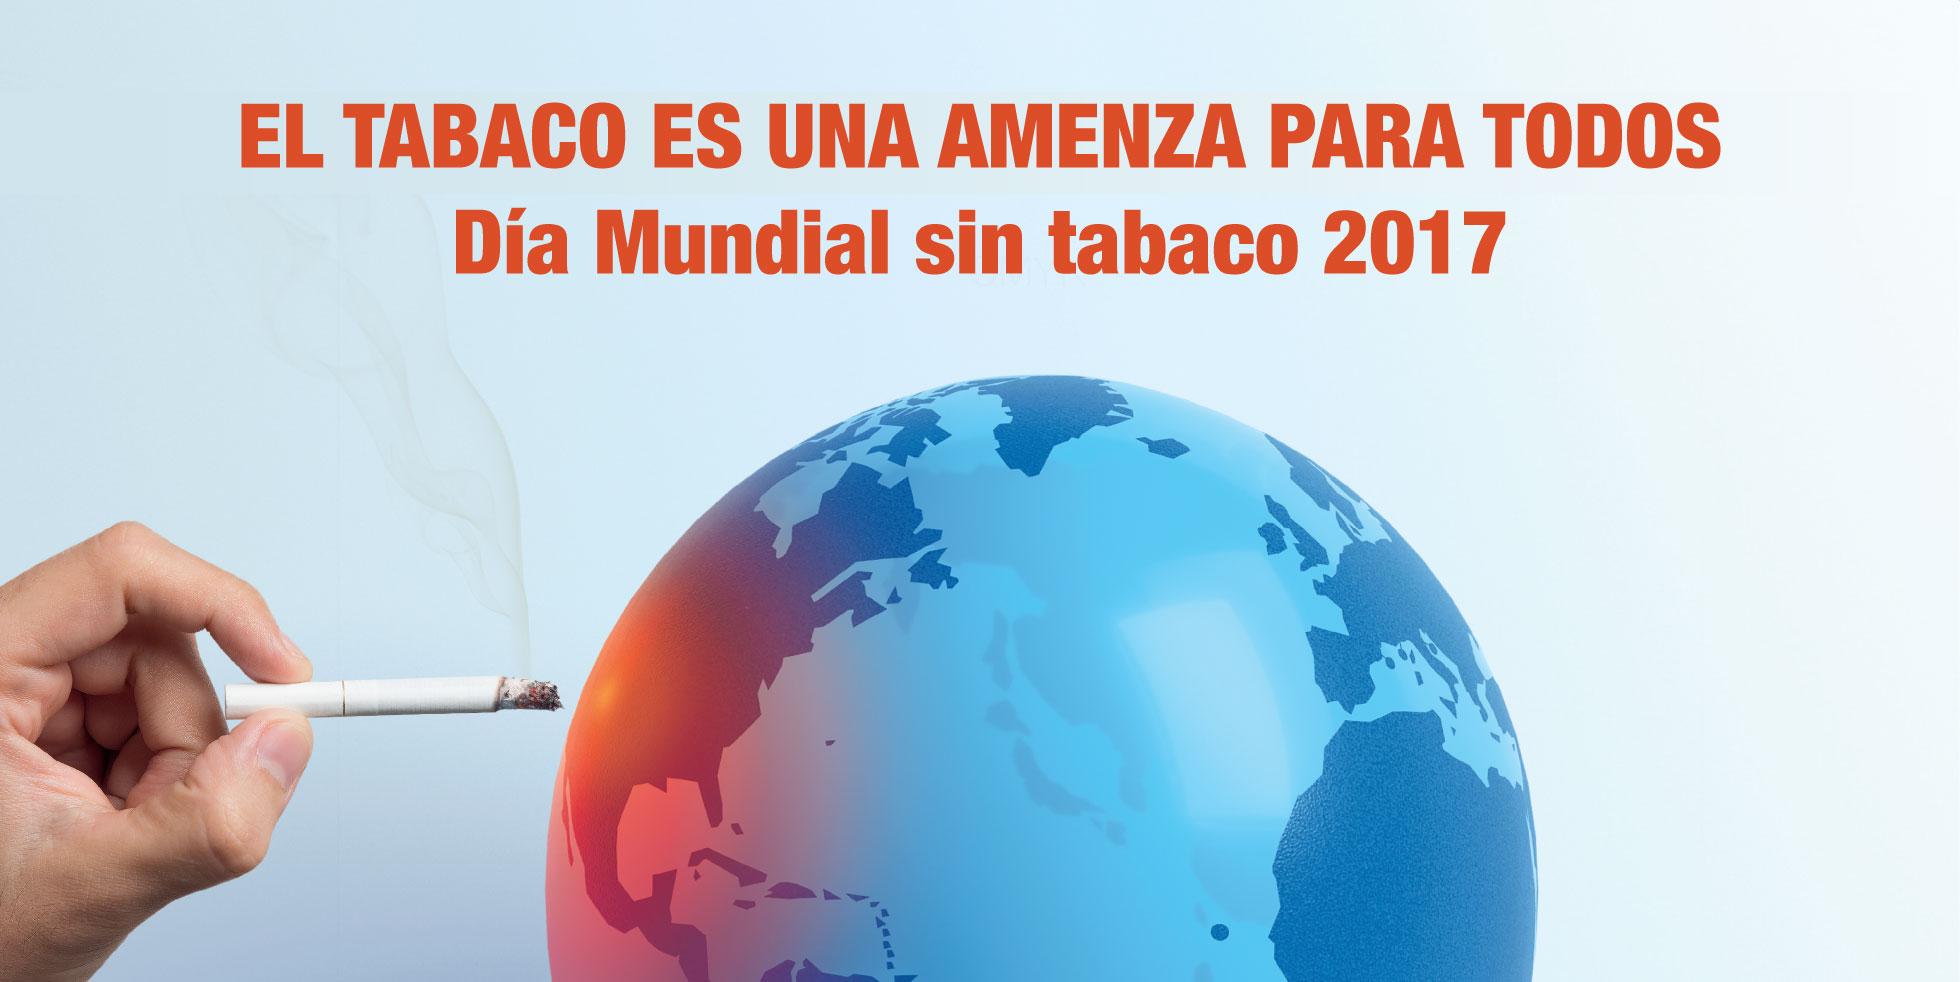 D a mundial sin tabaco 2017 c digo f for Cuarto dia sin fumar